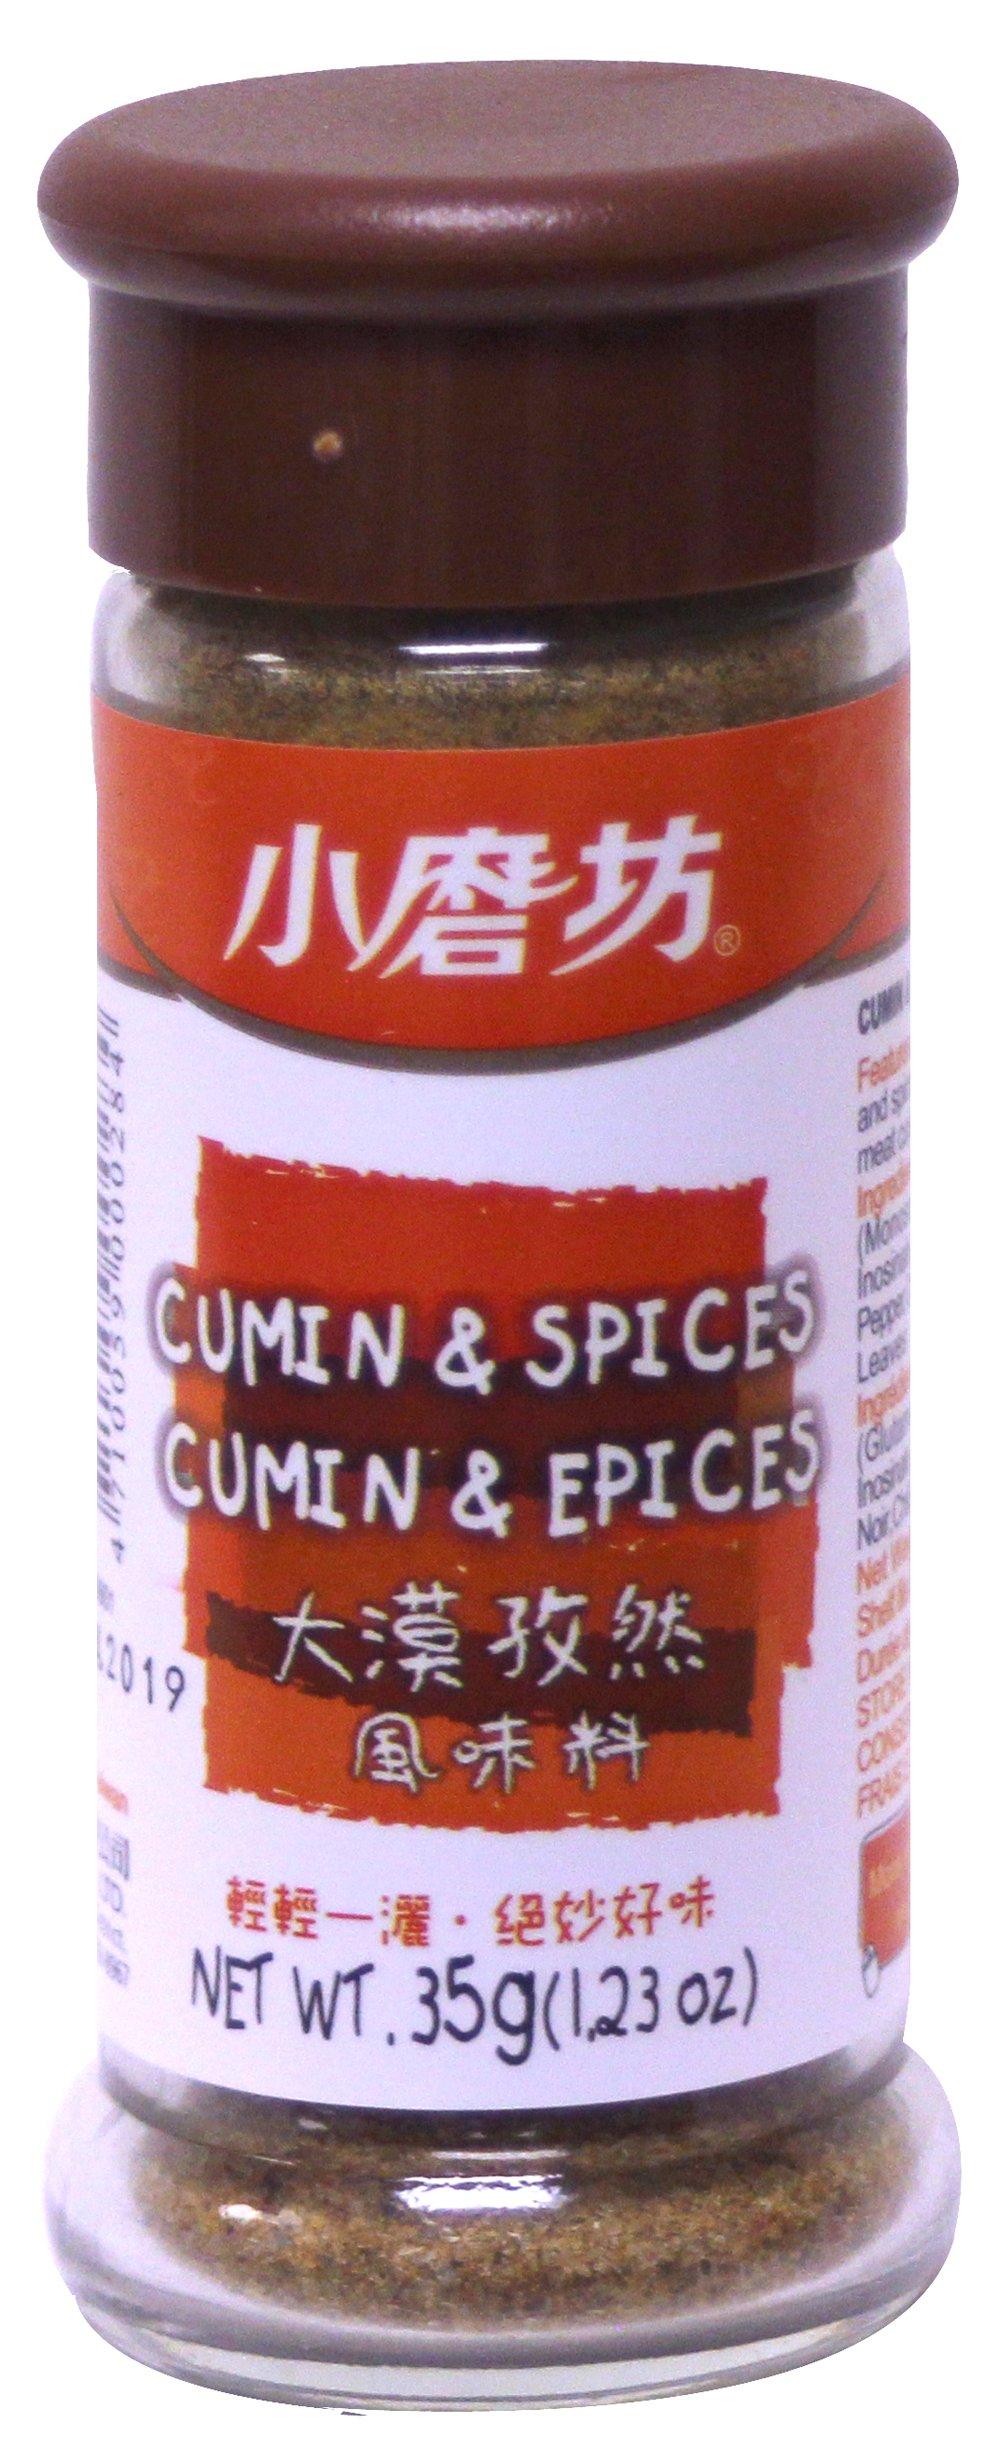 小磨坊大漠孜然風味料 (粉) All Natural Cumin & Spices Powder 1.23 oz (Pack of 6)